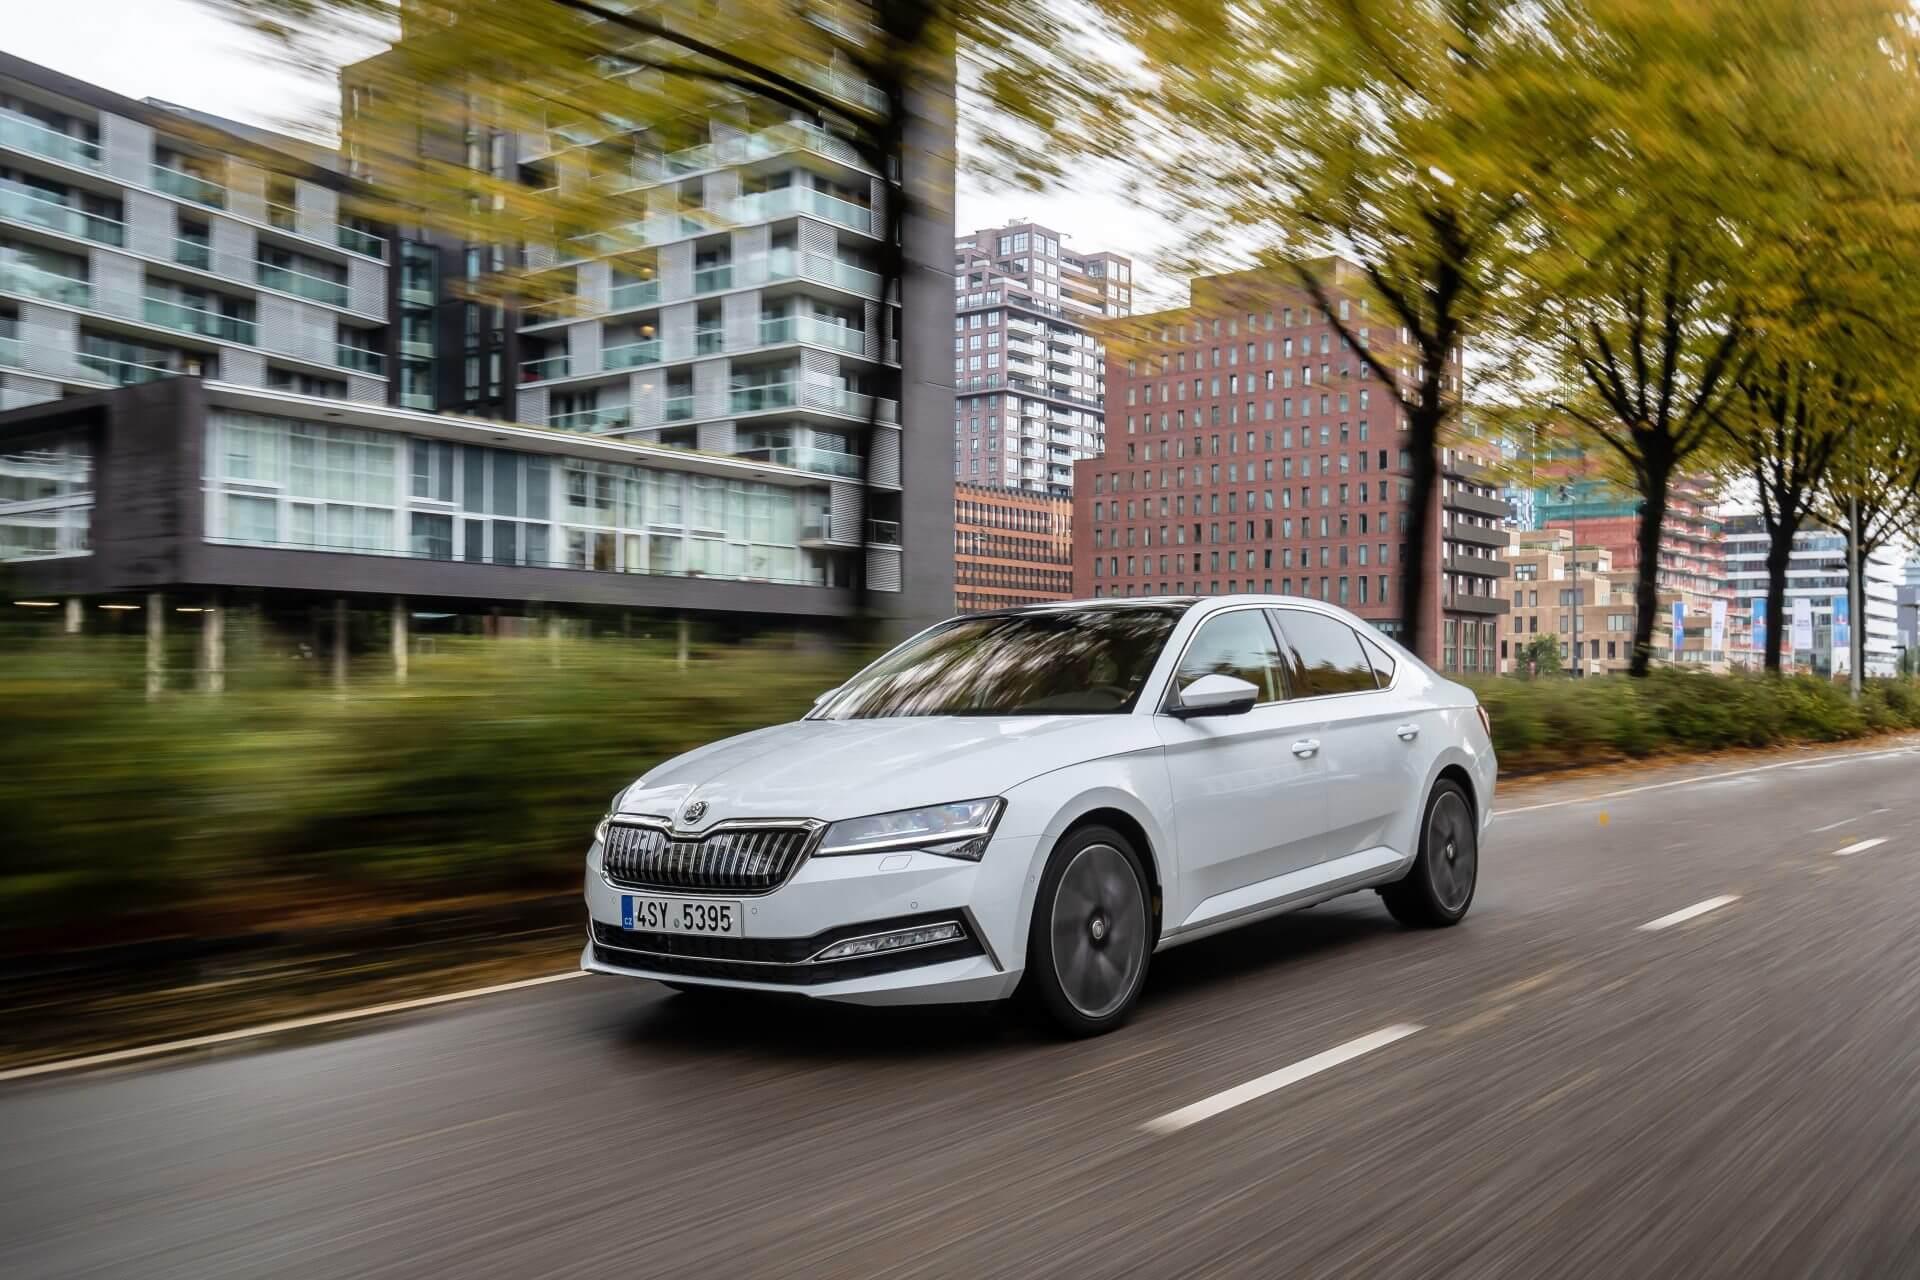 SKODA SUPERB - Καλύτερο Οικογενειακό Αυτοκίνητο της Χρονιάς για το 2020 - Auto Express